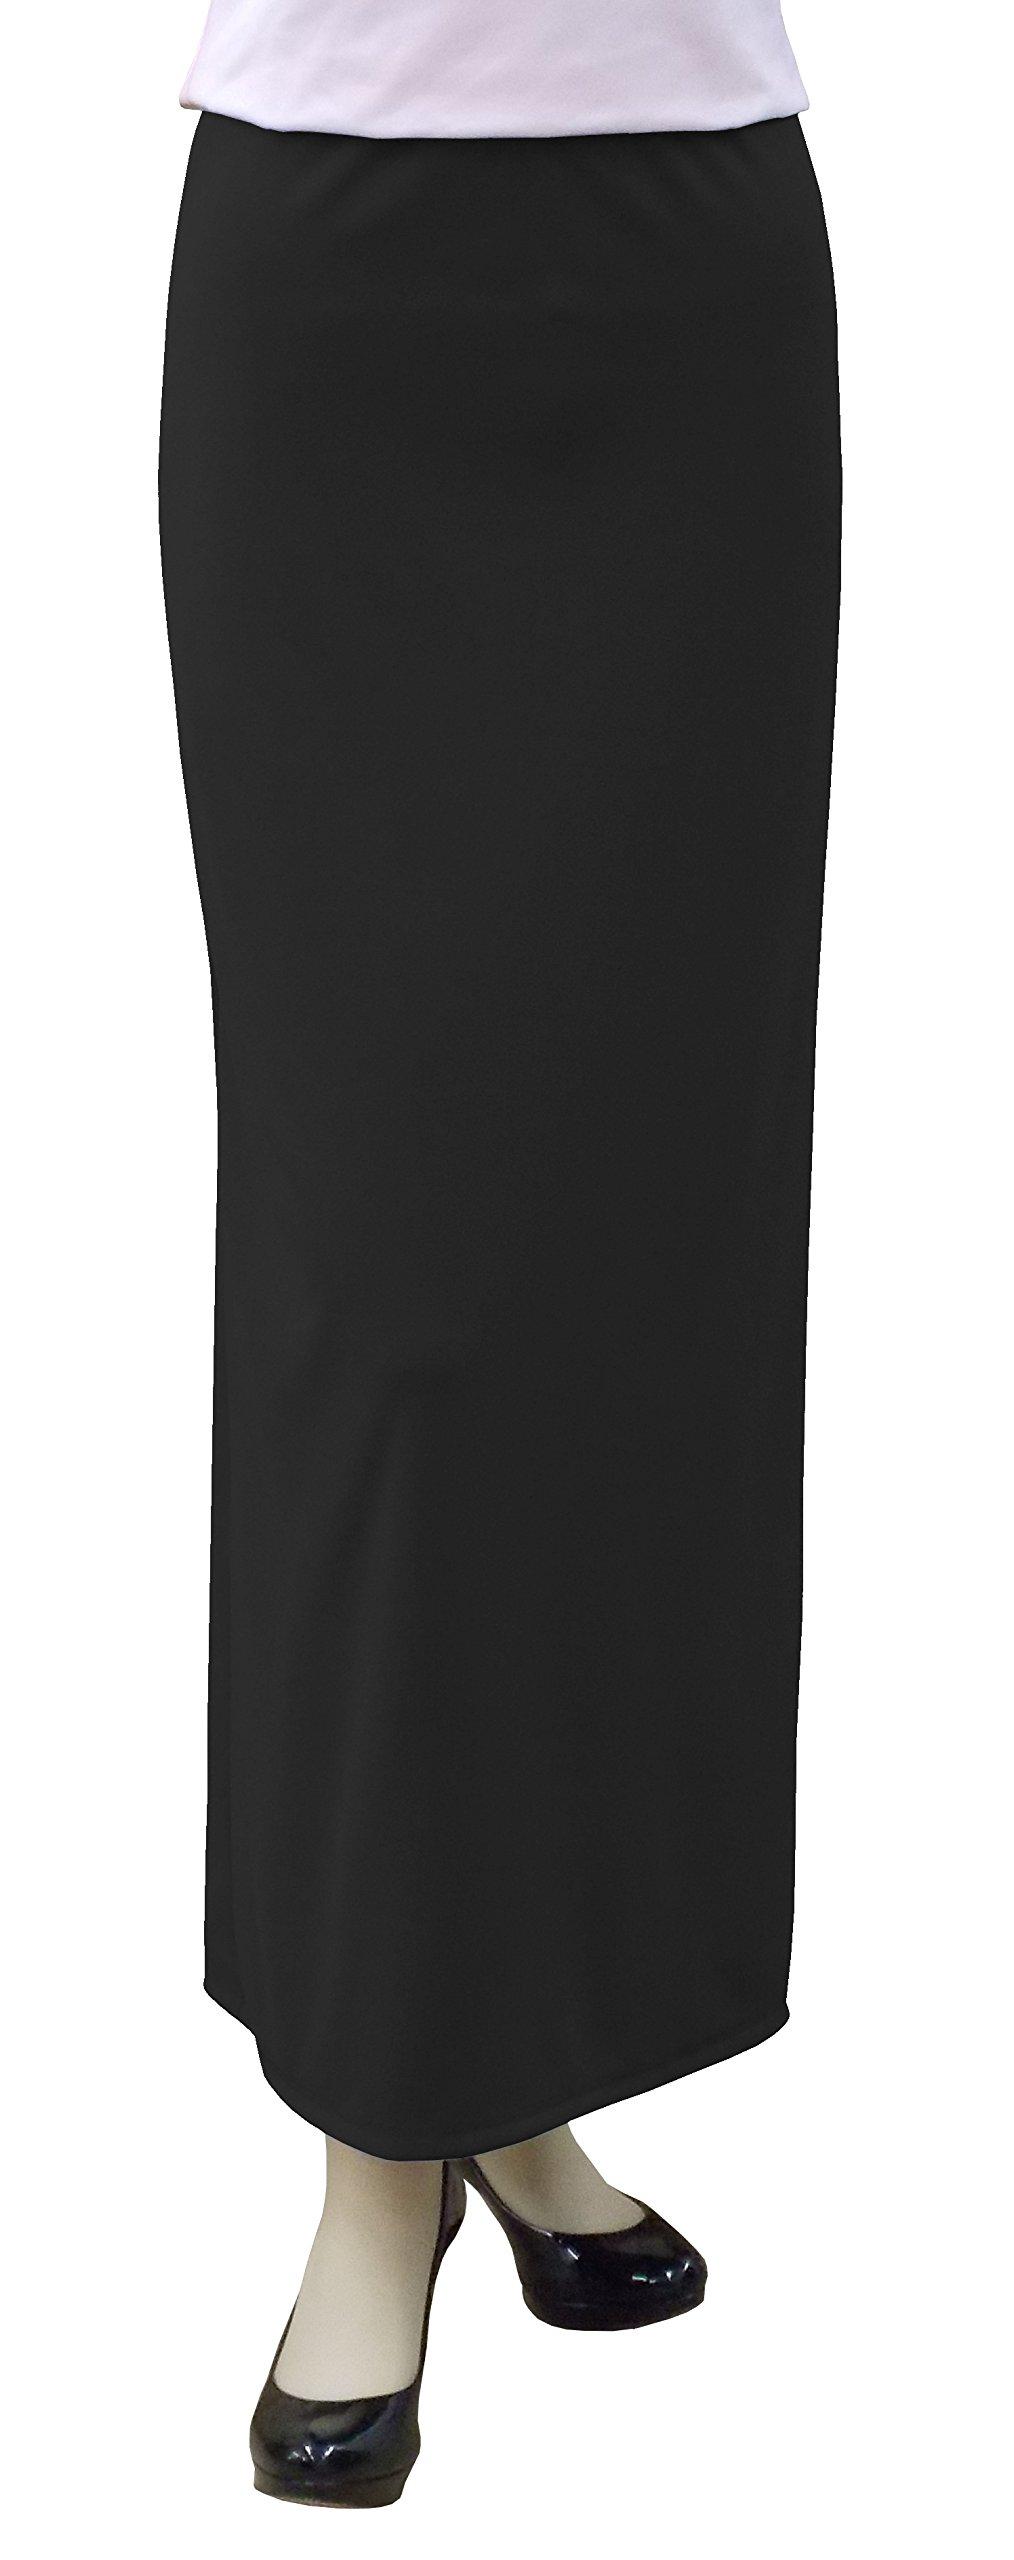 Baby'O Women's Basic Modest 37'' Ankle Length Stretch Knit Straight Skirt, BLK, 8